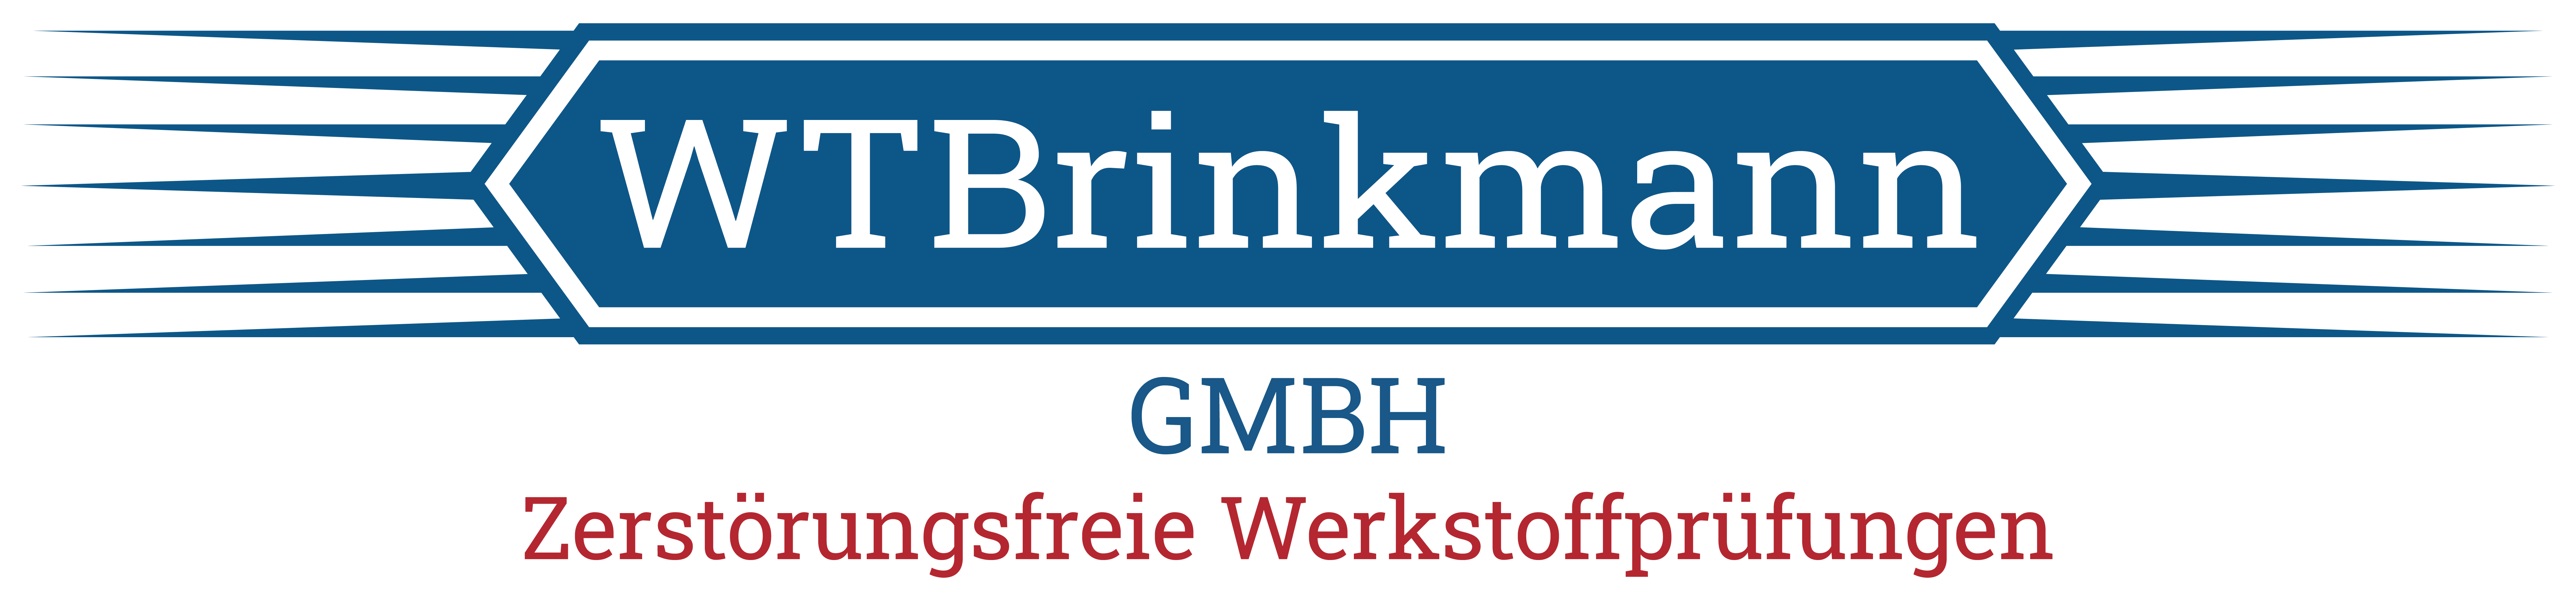 Werkstoffprüftechnik Brinkmann